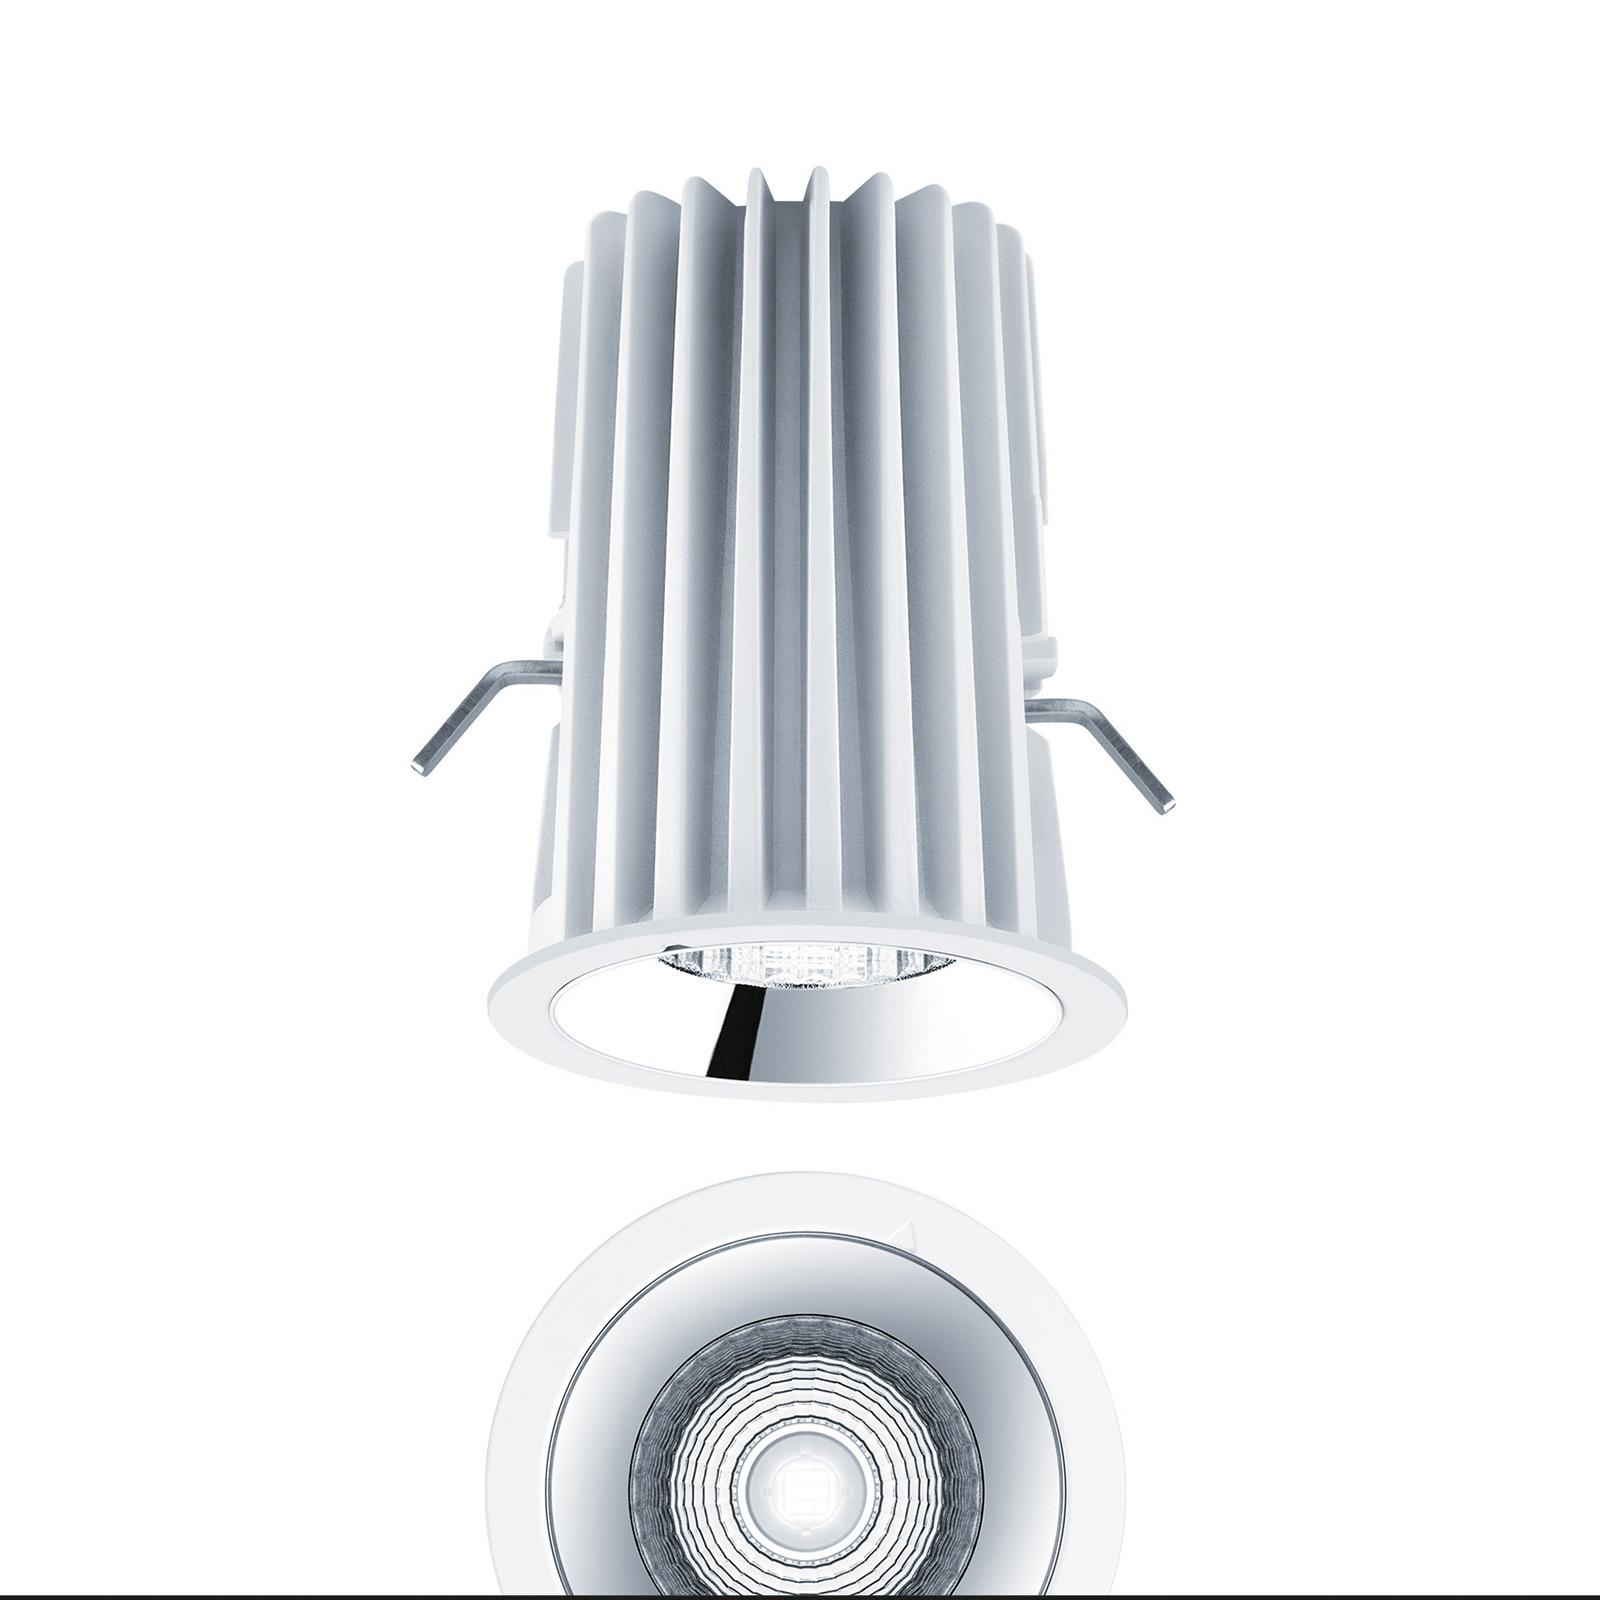 Zumtobel Diamo Einbaulampe Bluetooth Flood 3.000 K